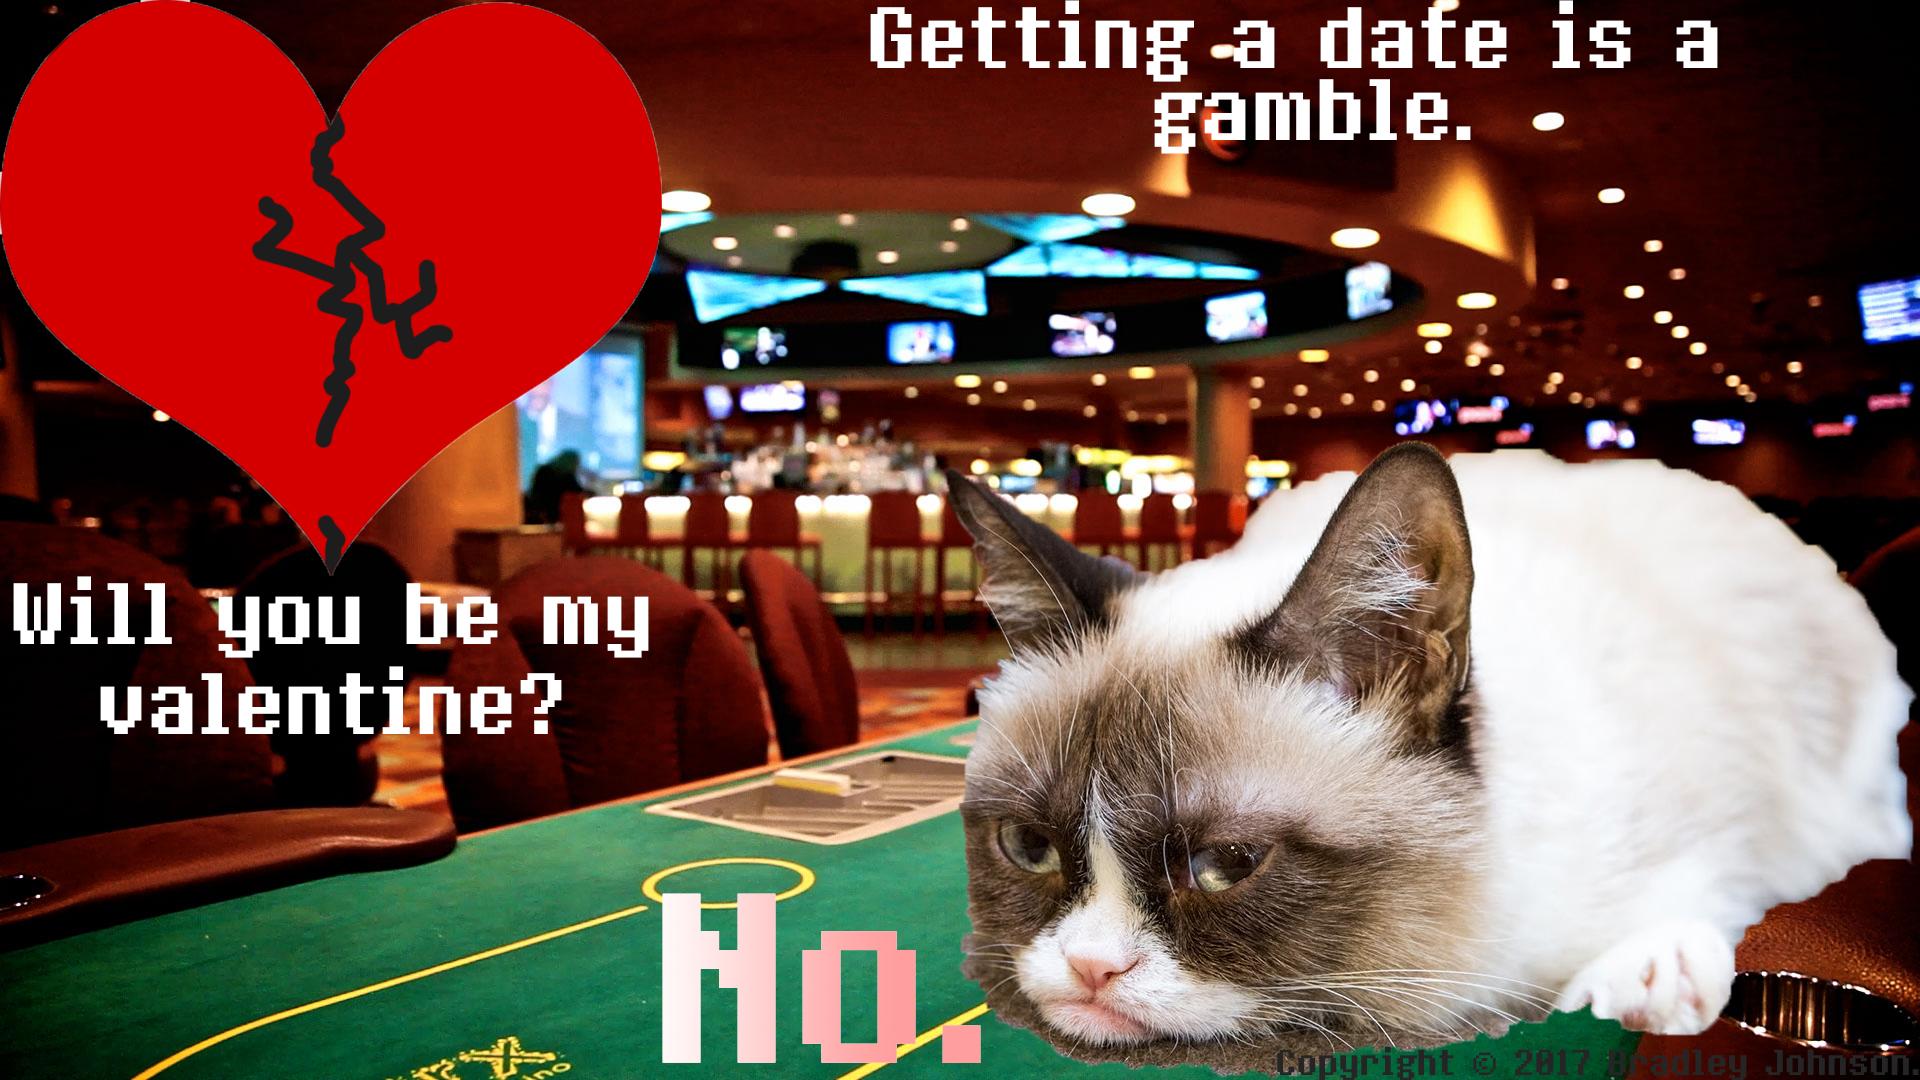 Getting a Date is a Gamble by Peekofwar